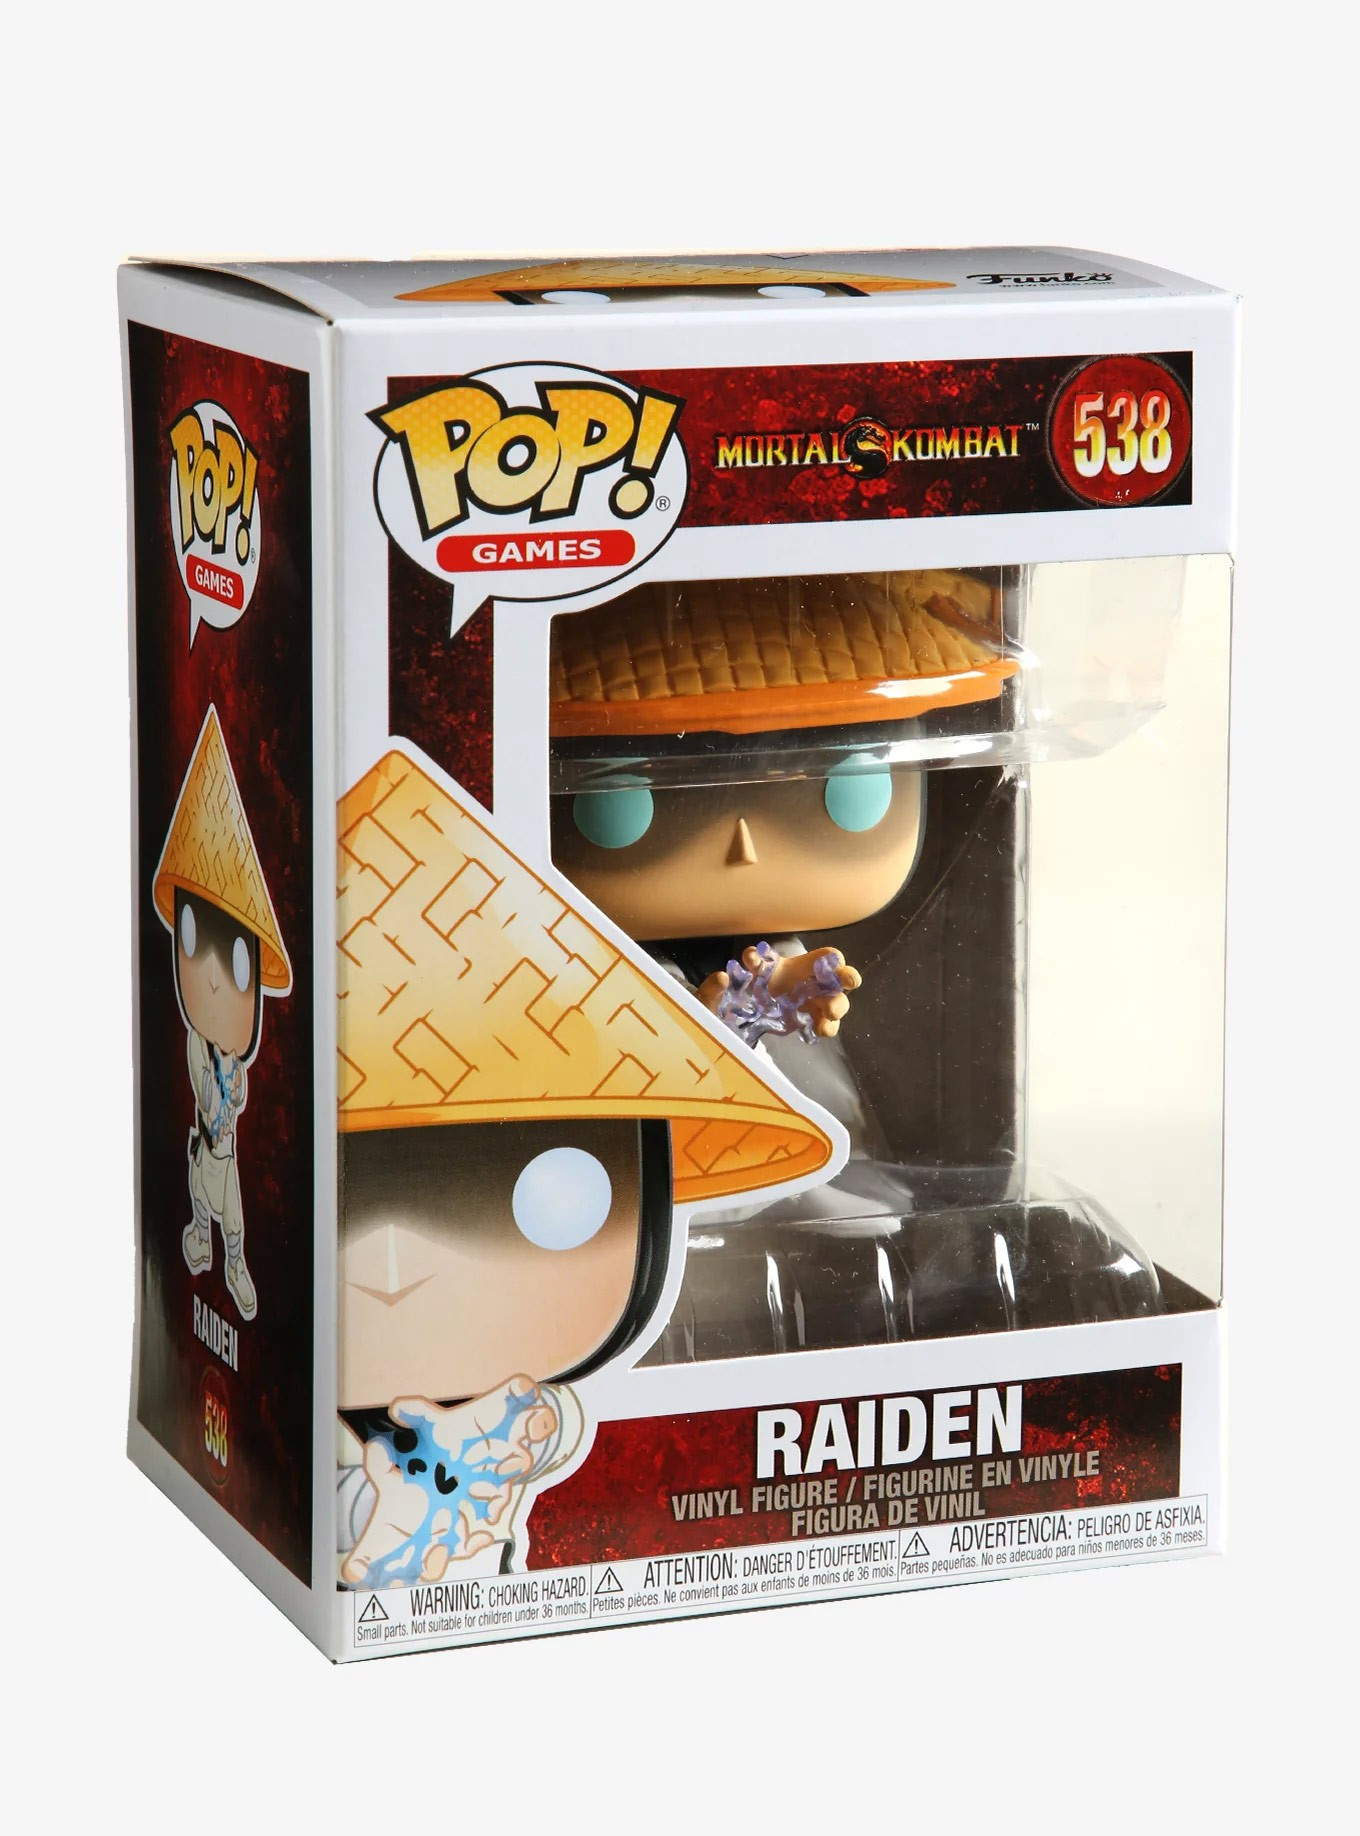 Raiden #538 - Mortal Kombat - Funko Pop! Games